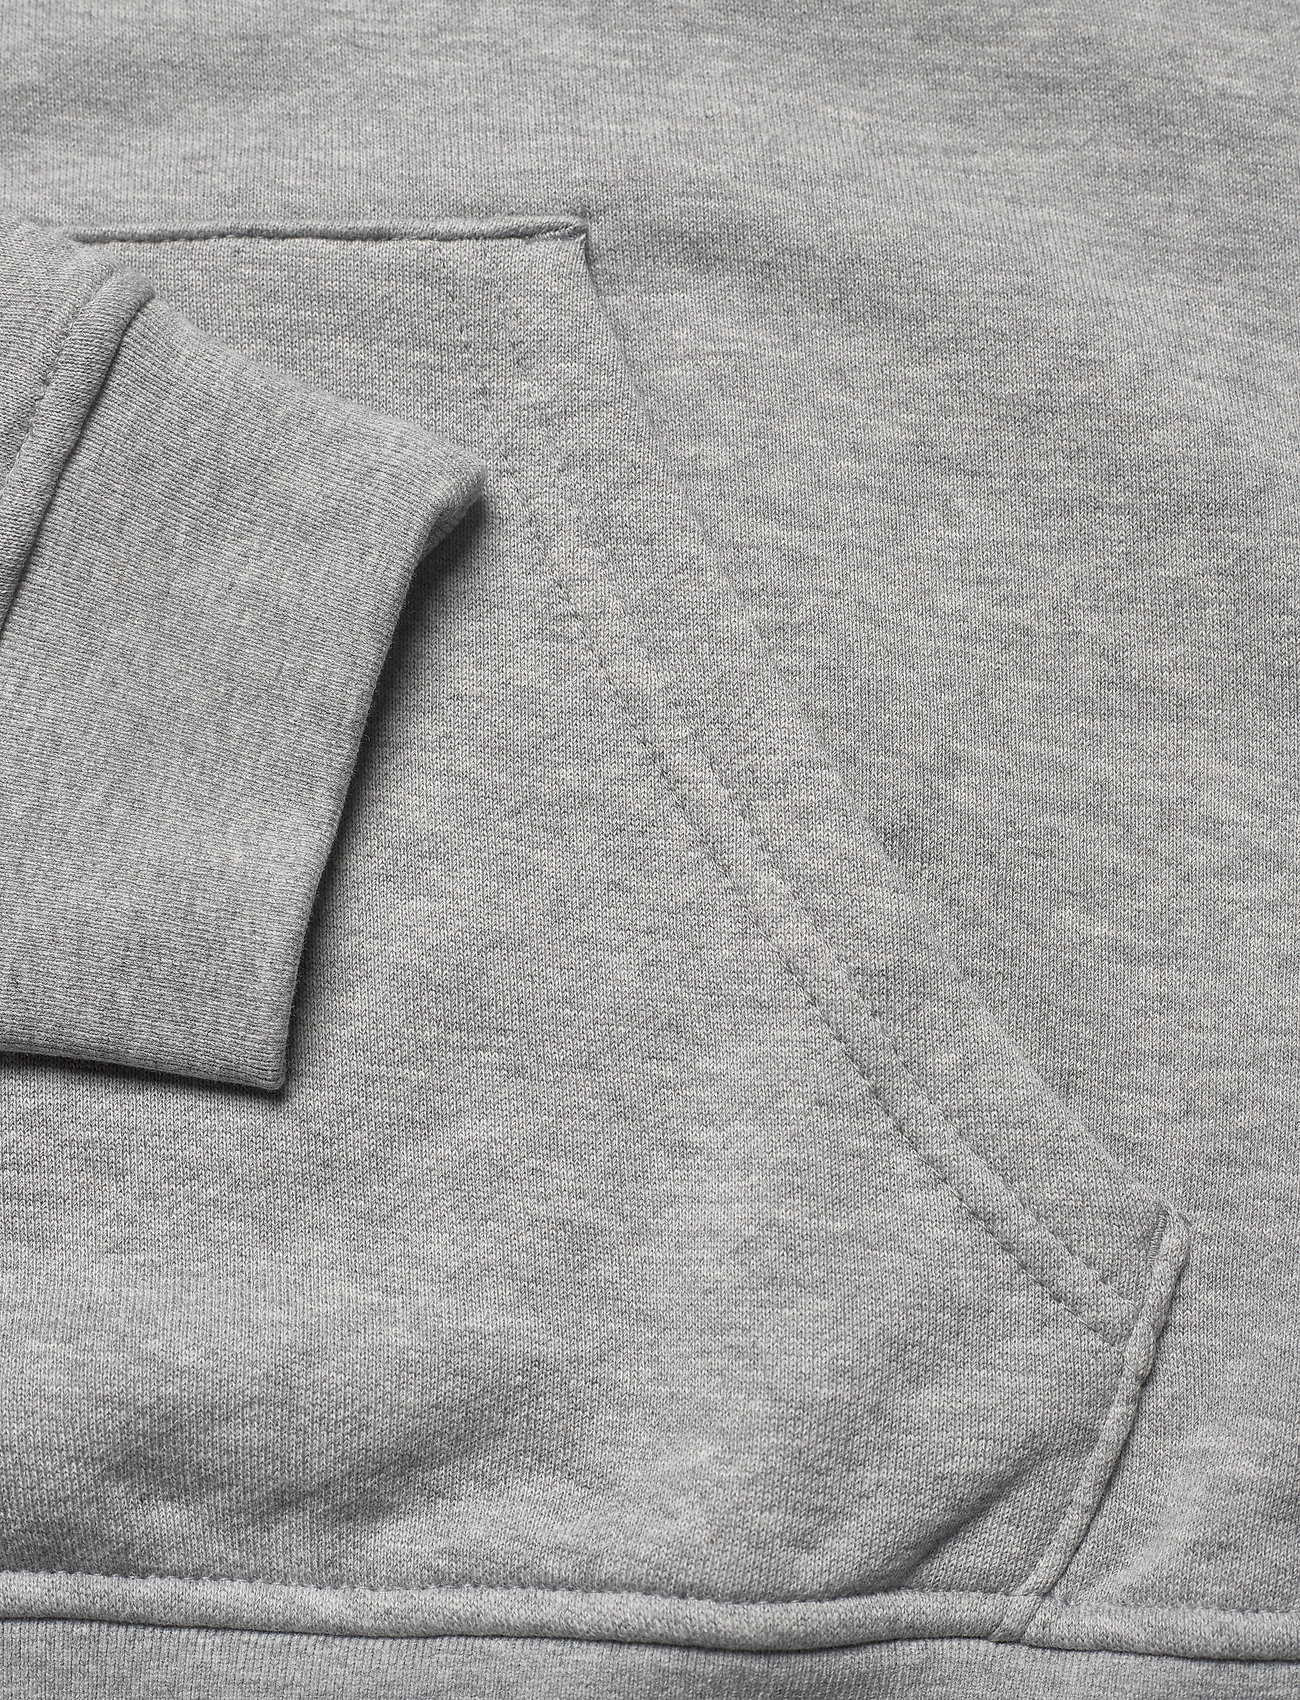 adidas Originals ZENO HOOD - Sweatshirts MGREYH/SCARLE - Menn Klær